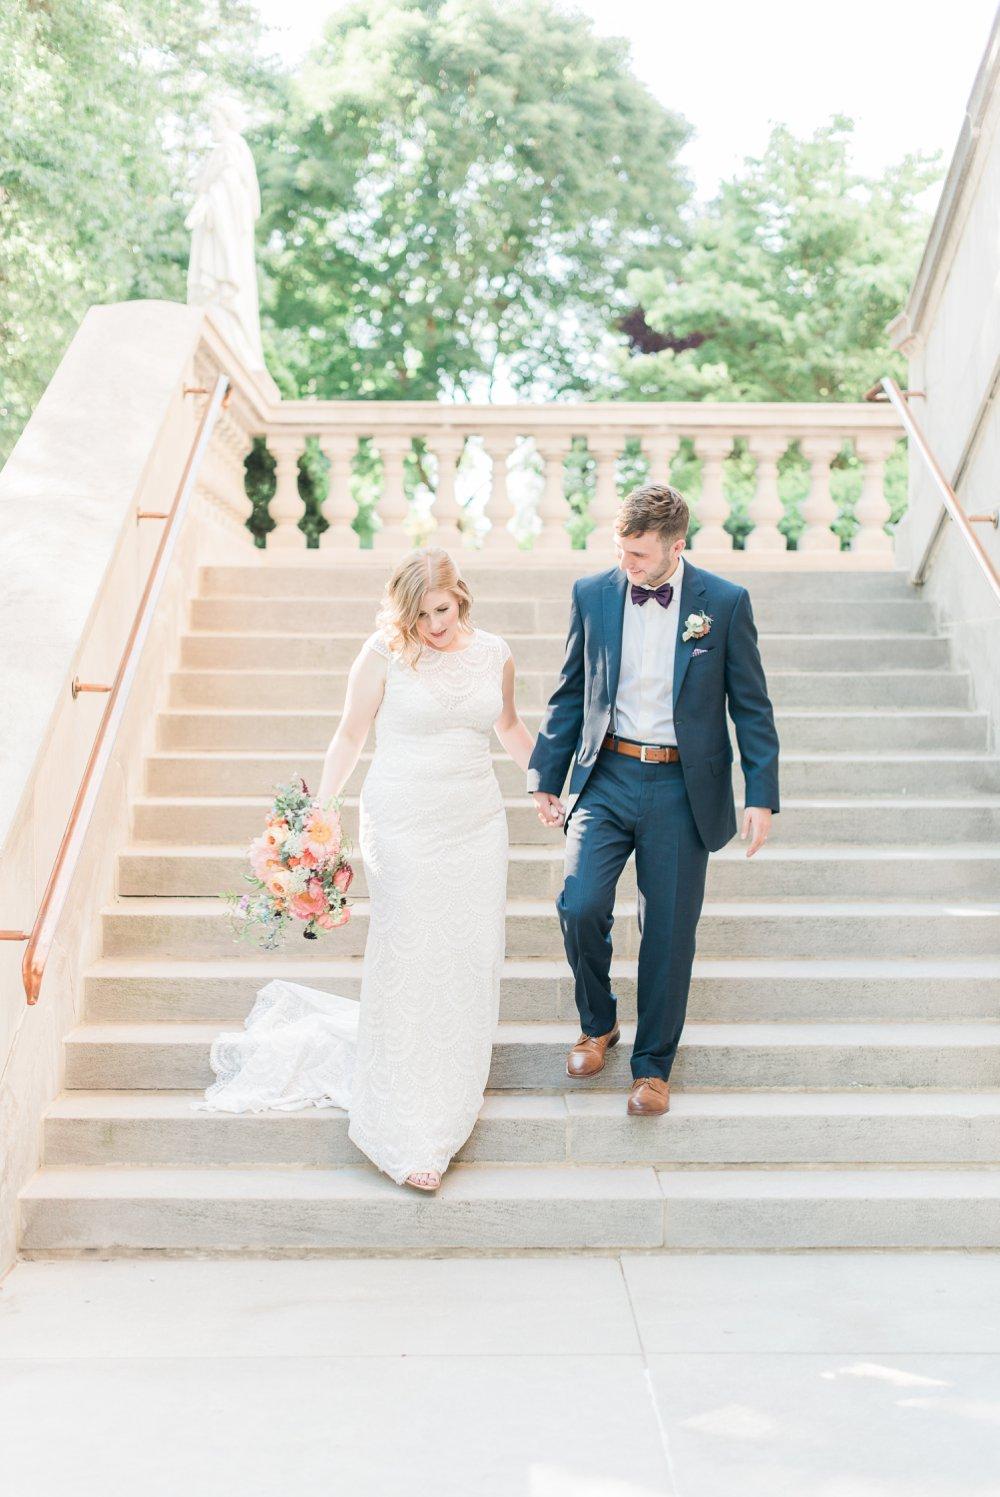 marietta-ohio-wedding-adelphia-music-hall-st-mary-basillica_0213.jpg